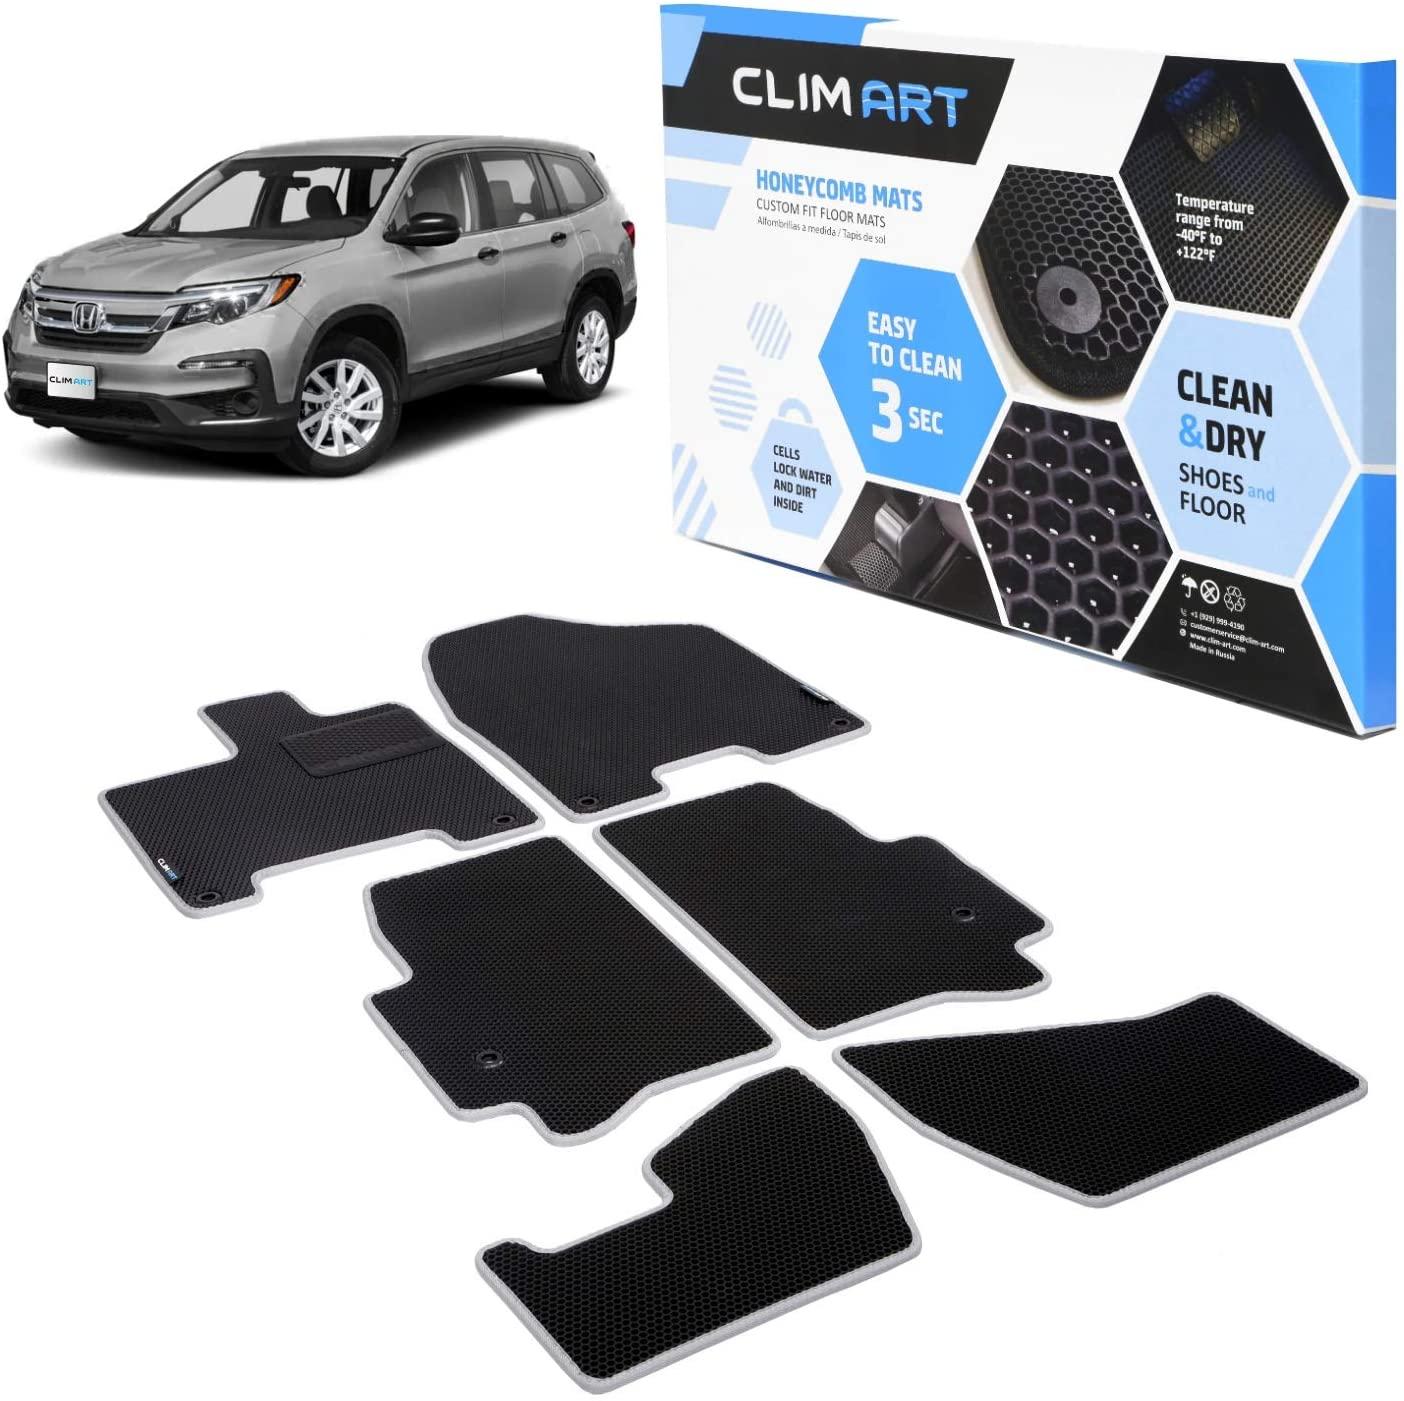 CLIM ART Honeycomb Custom Fit Floor Mats for Honda Pilot 2016-2020, 1st & 2nd & 3rd Row, Car Floor Liner, Allweather, Car Accessories, Tapetes para Autos, Black/Silver – FL041616067